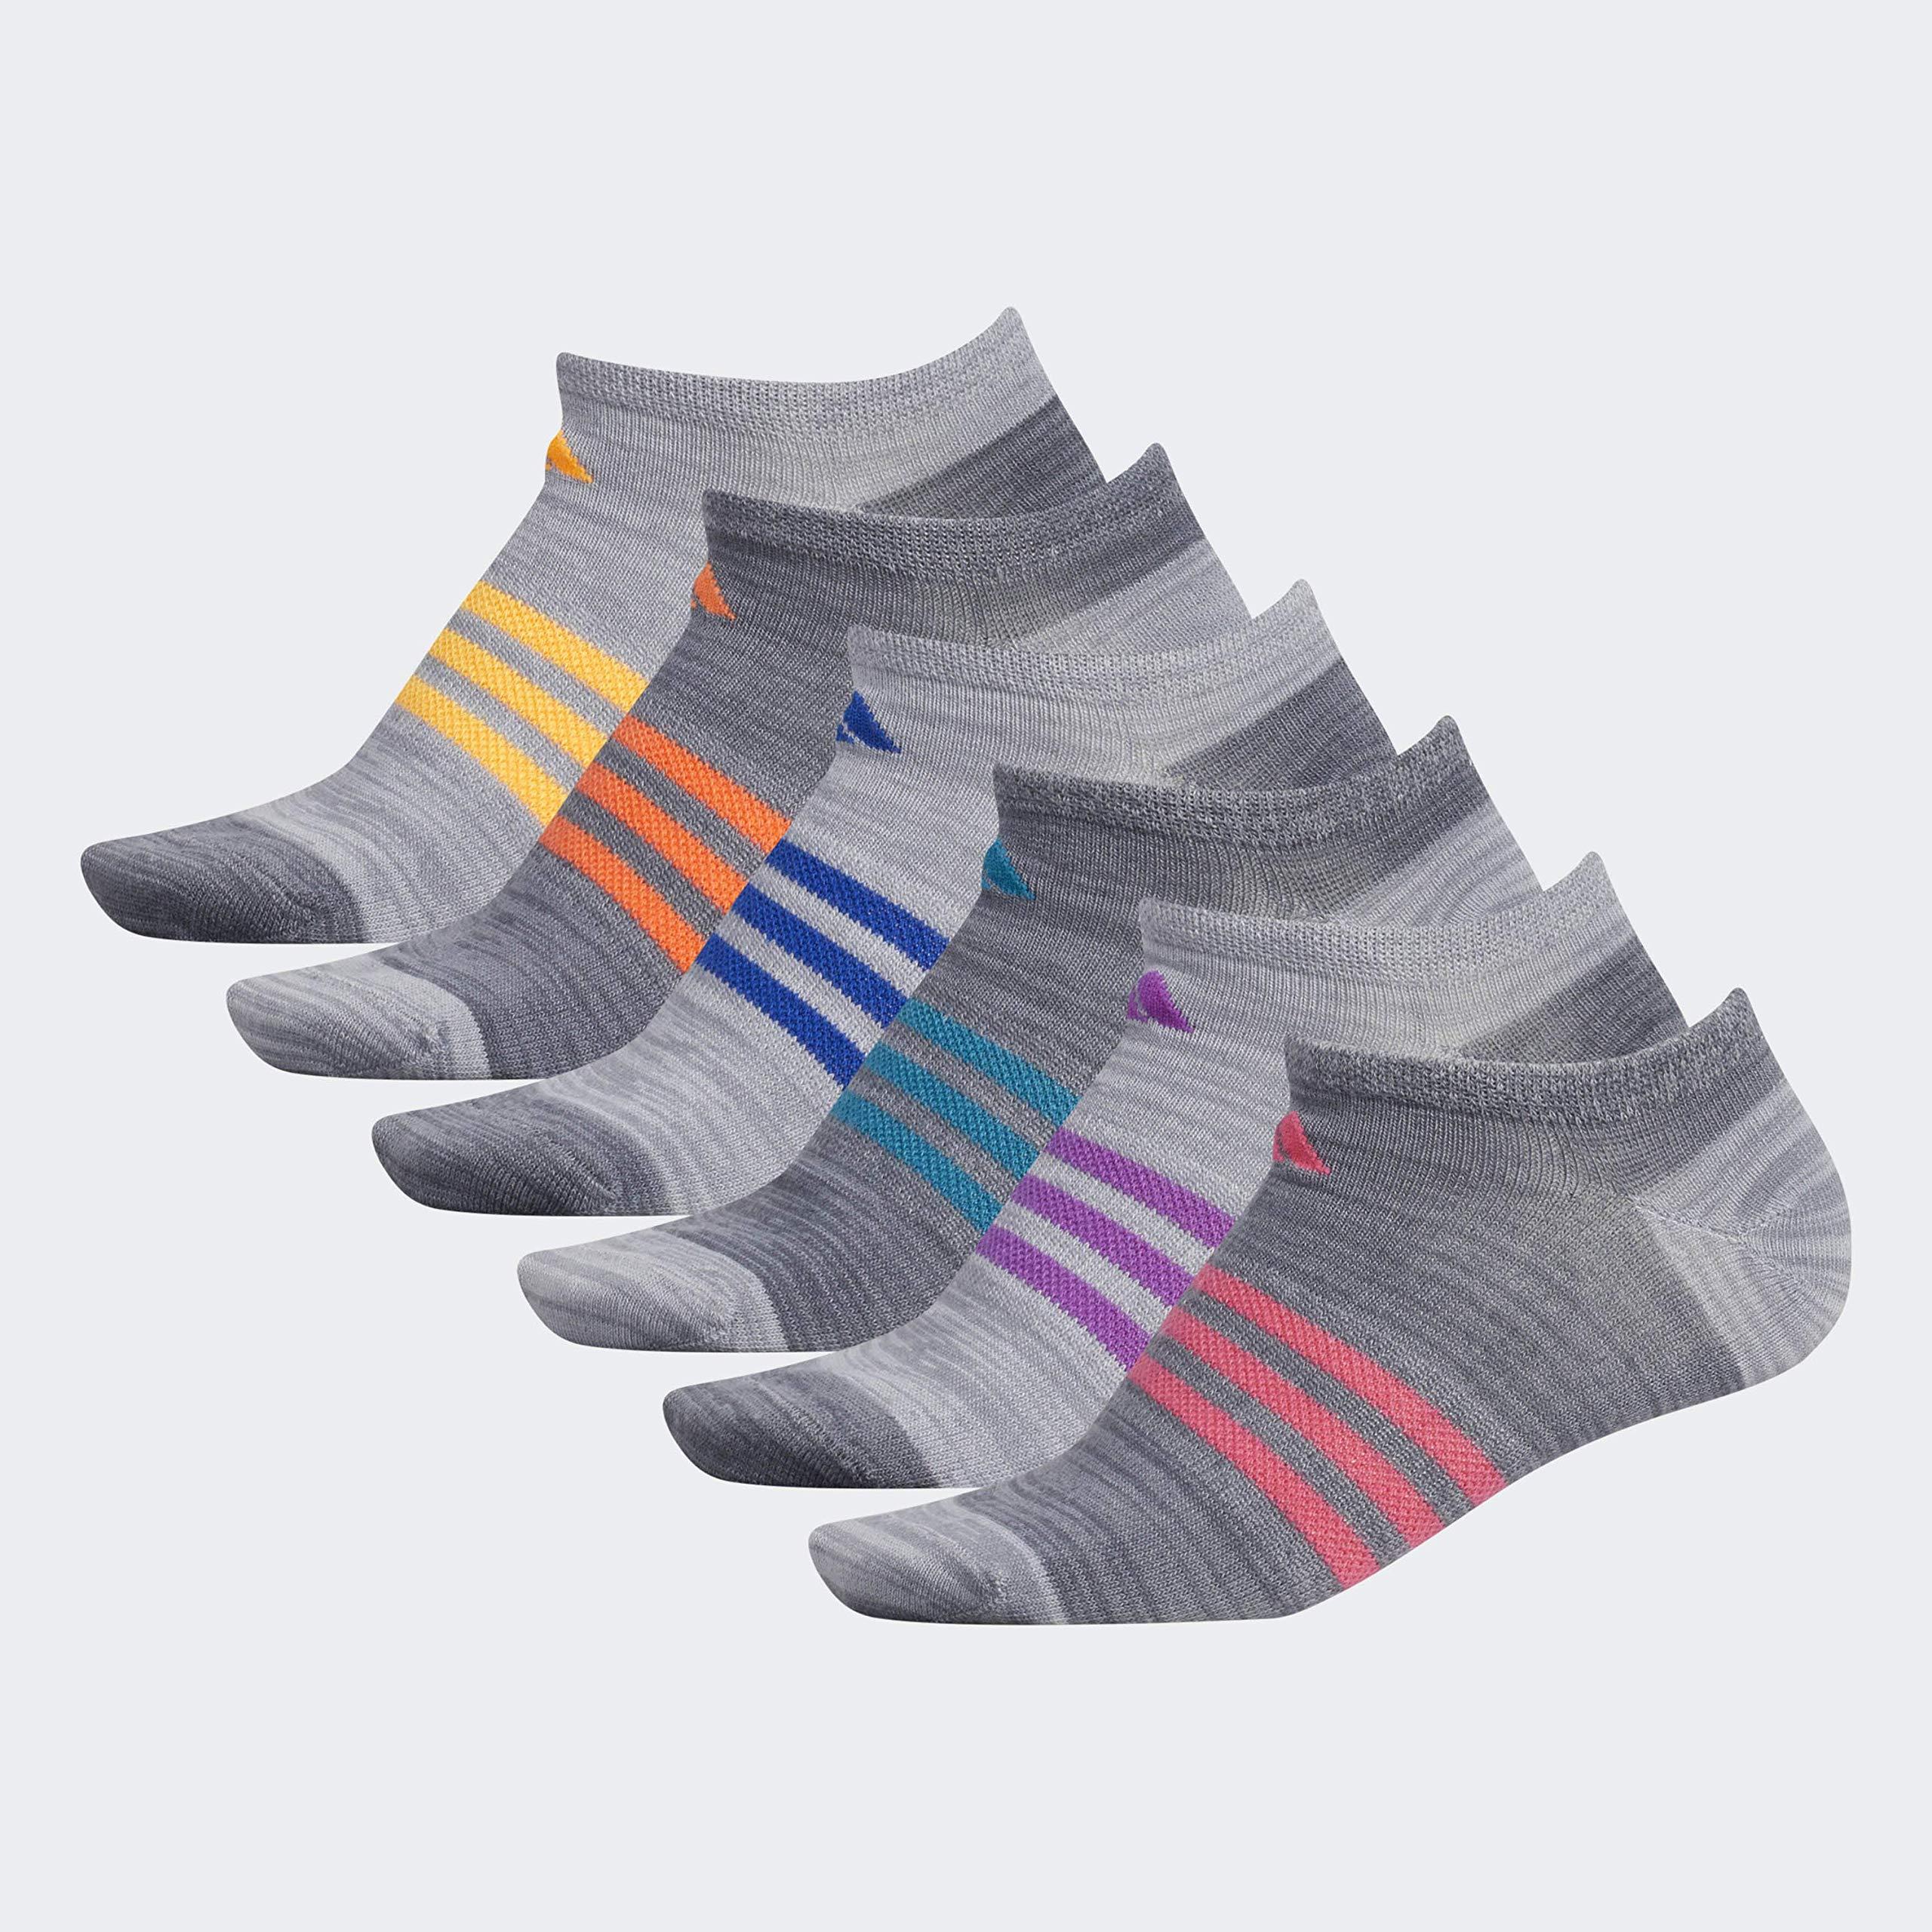 adidas Women's Superlite No Show Socks (6-Pair), Grey - Onix Space Dye/Clear Onix - Grey Space Dye/Real, Medium, (Shoe Size 5-10) by adidas